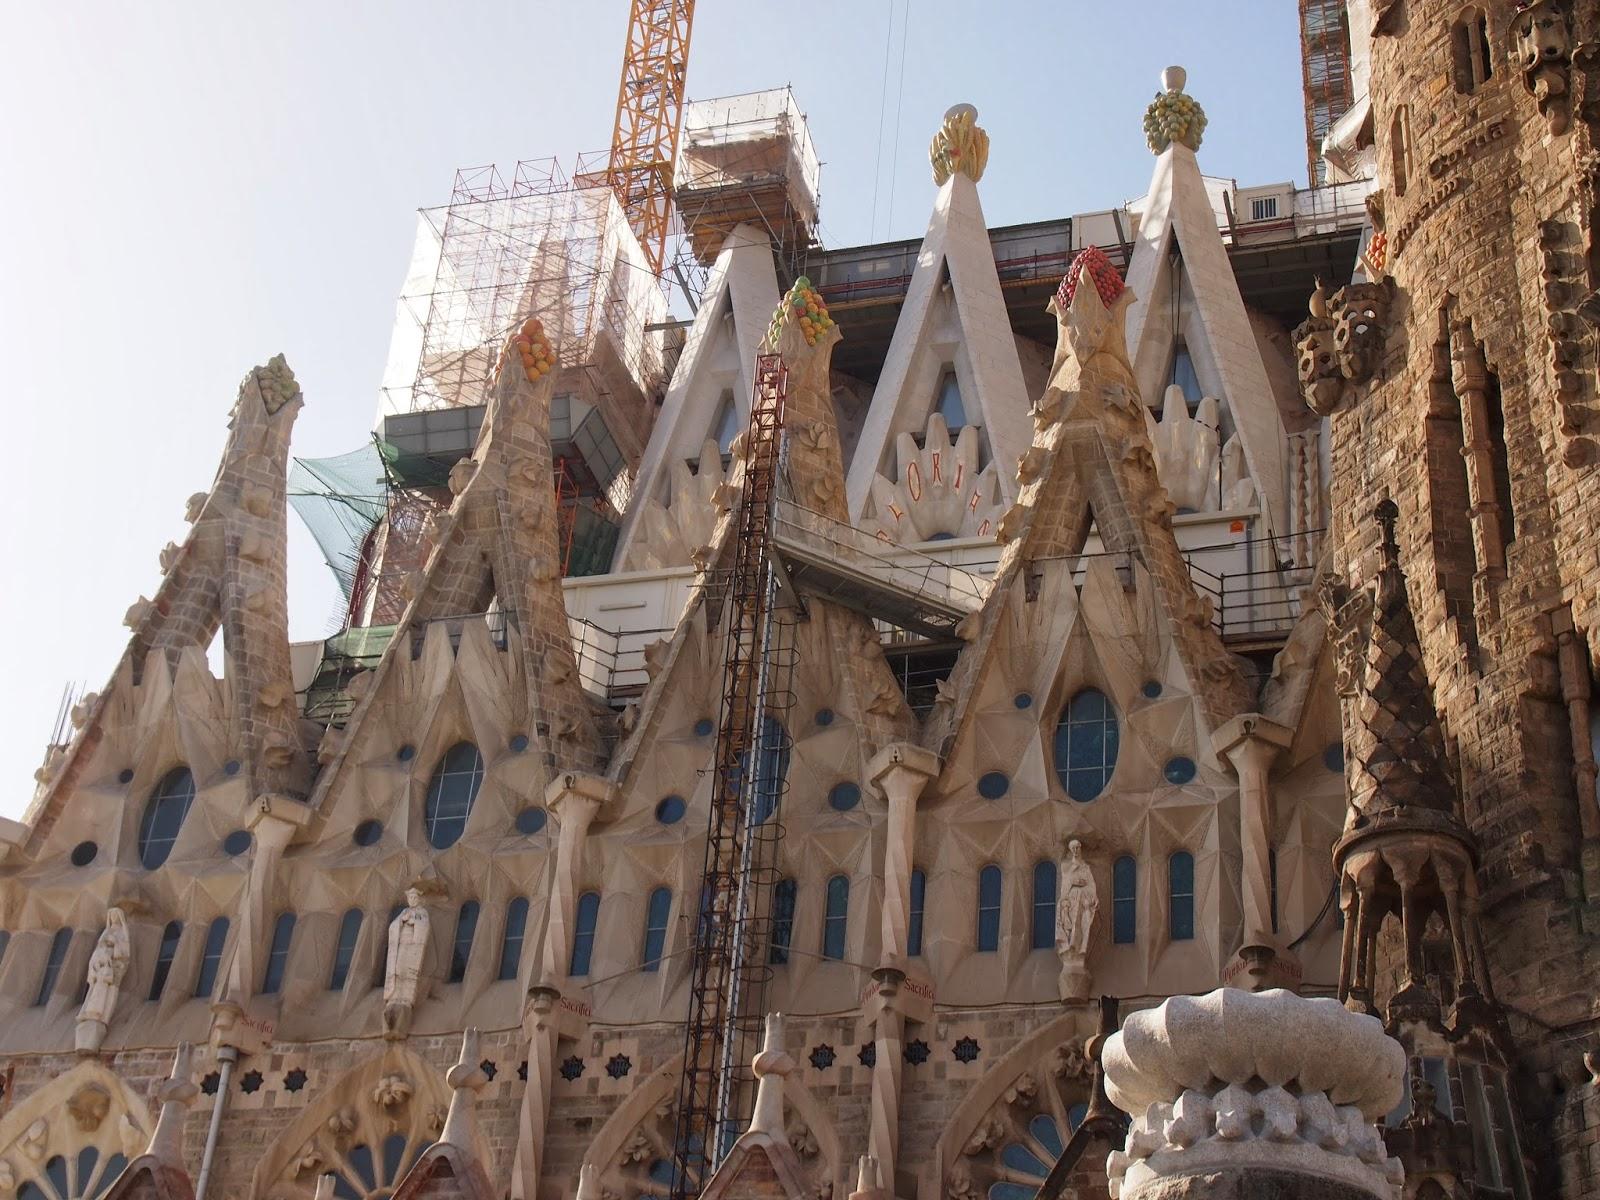 La Sagrada Familia under construction